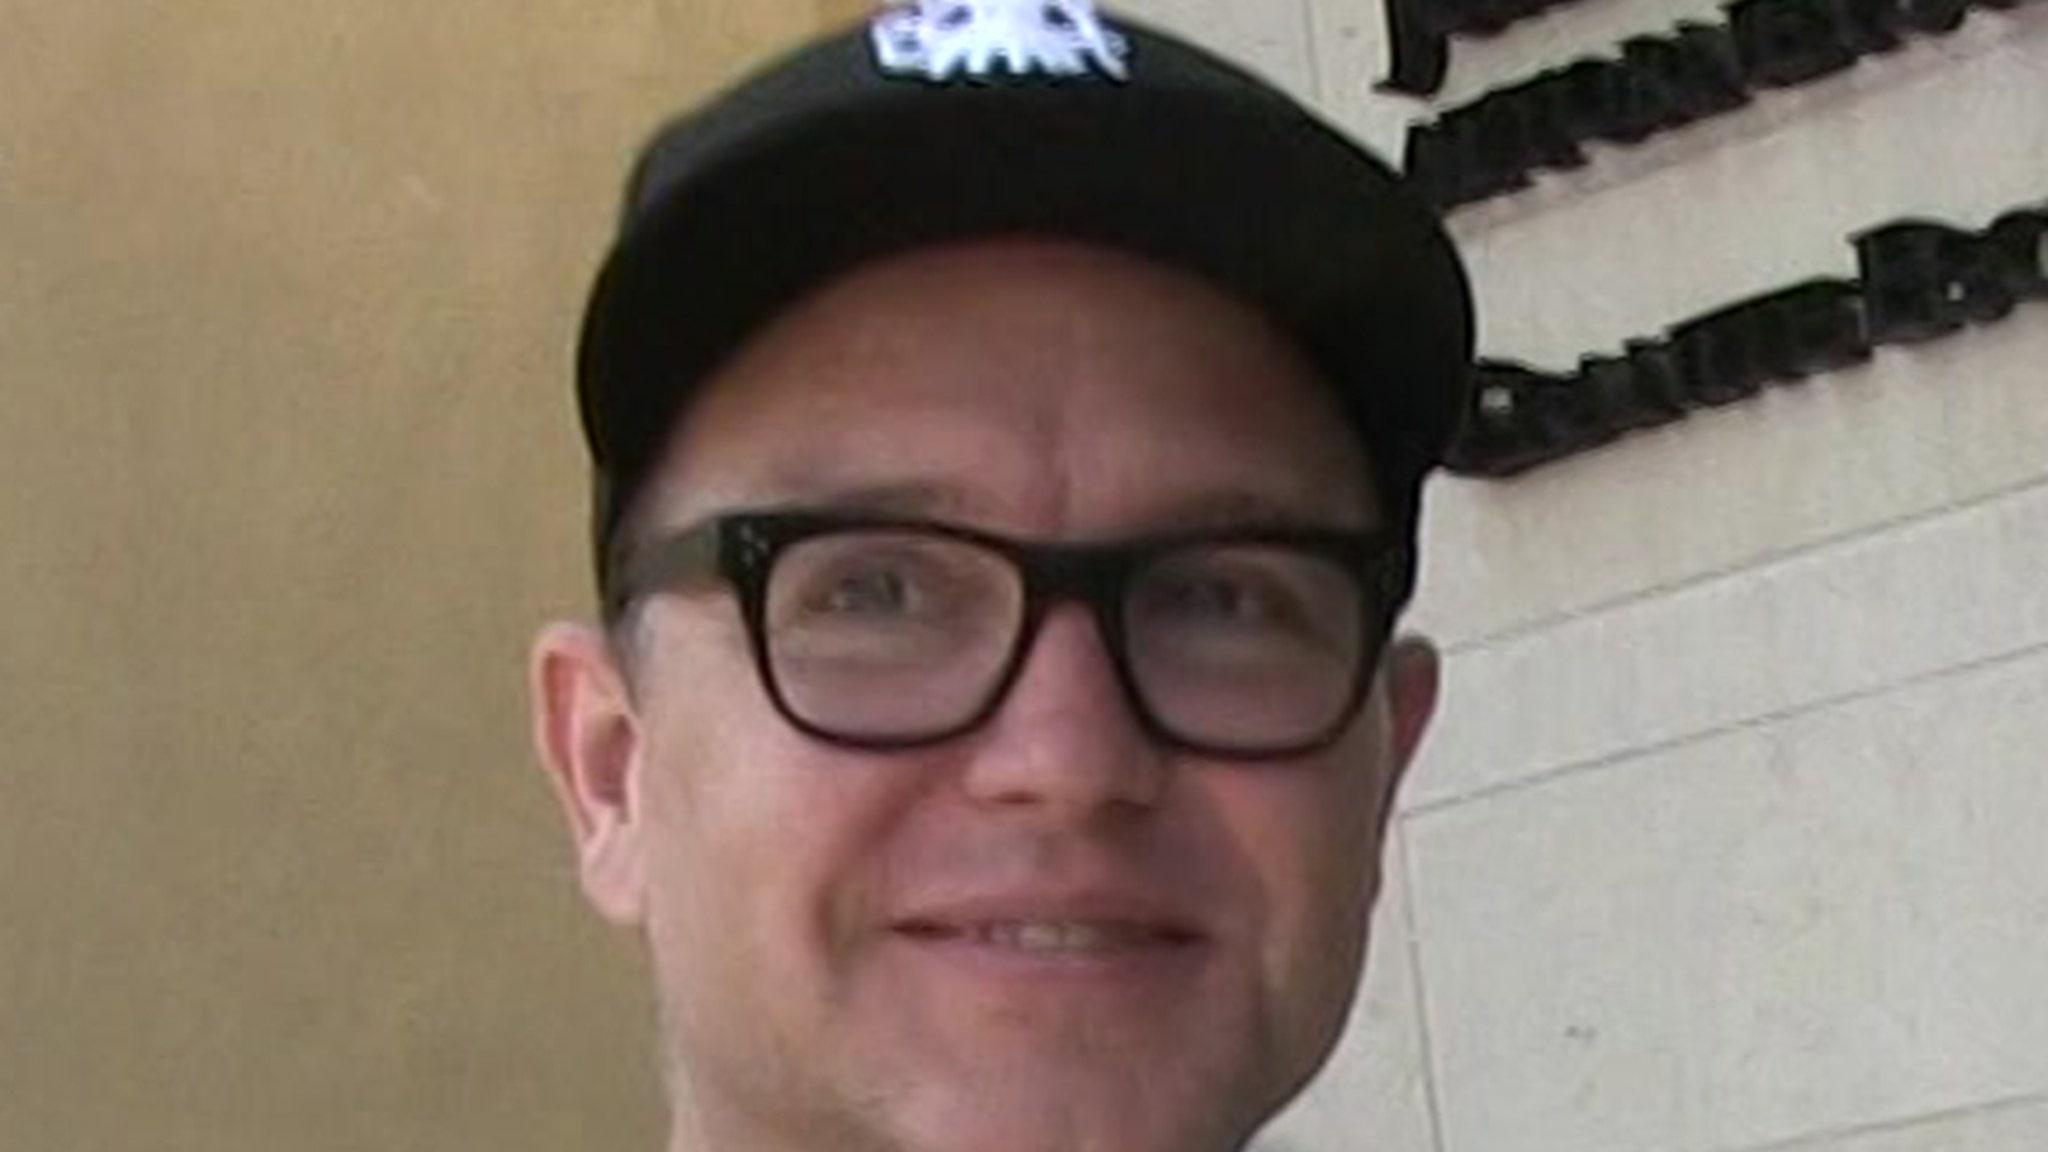 Blink-182's Mark Hoppus Says He's Cancer Free